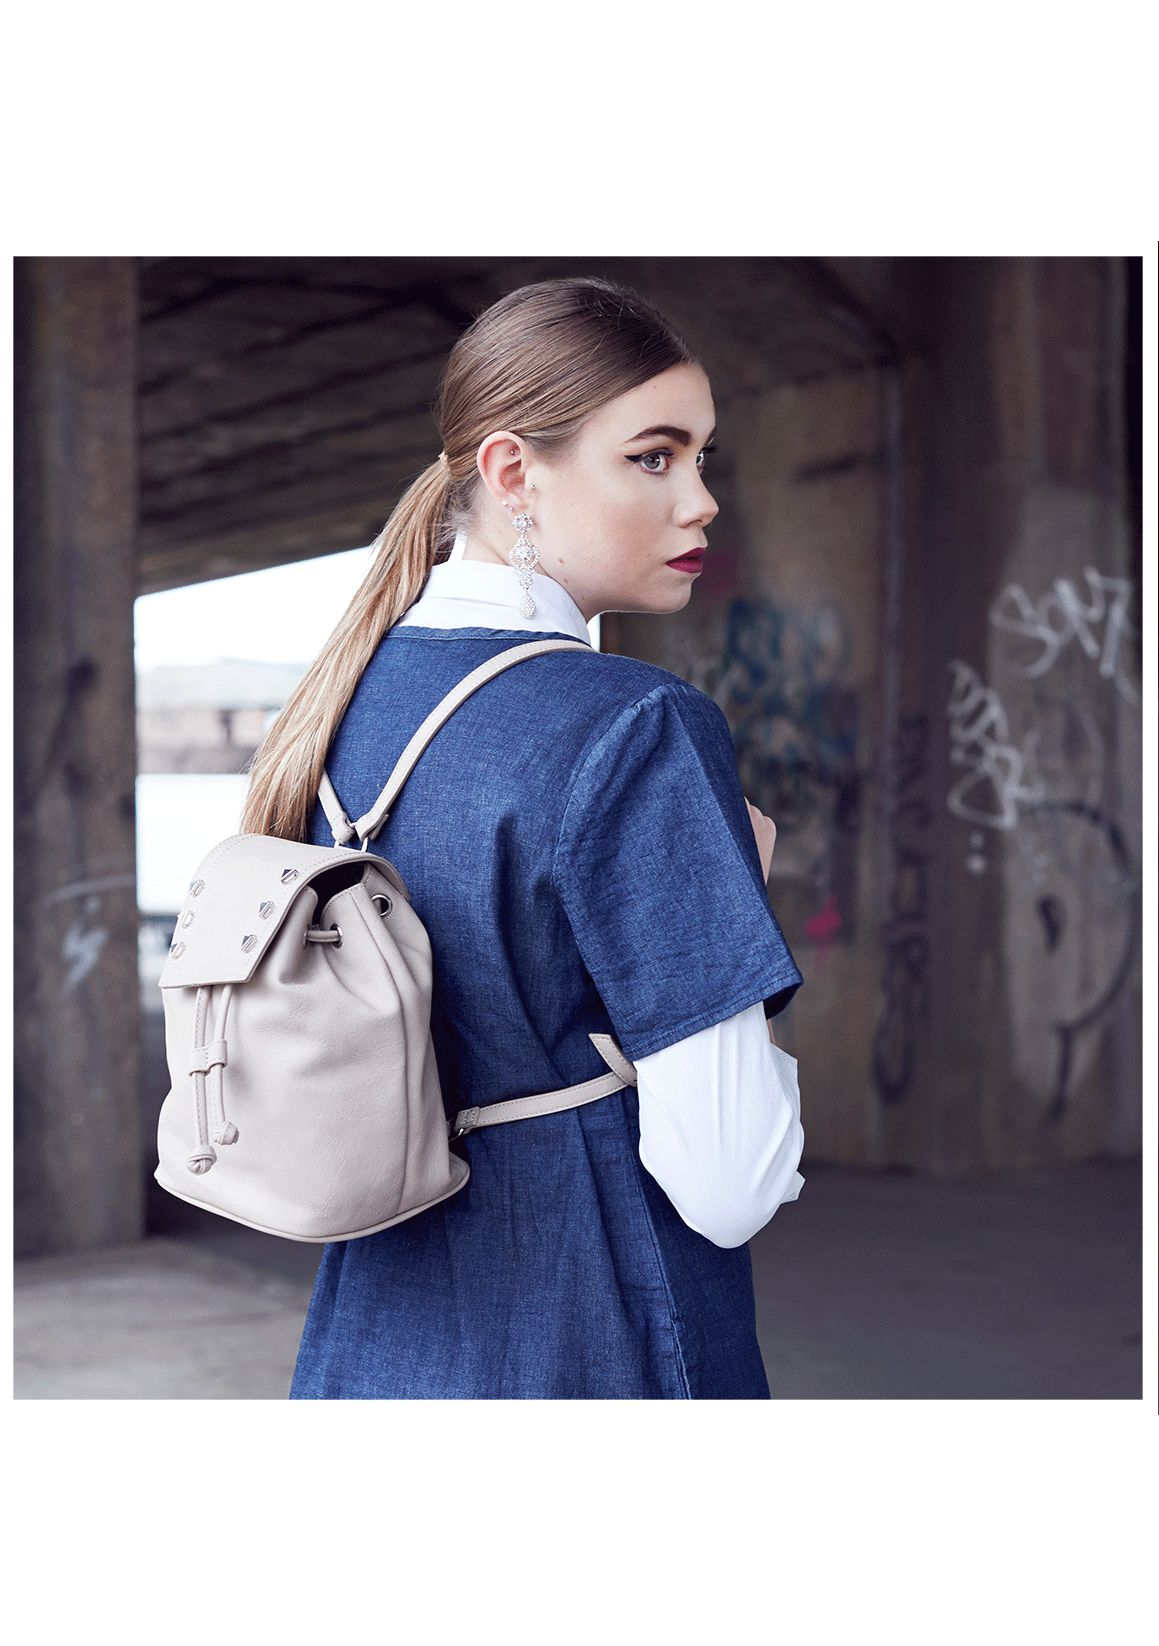 Danielle Nicole Morgan Backpack